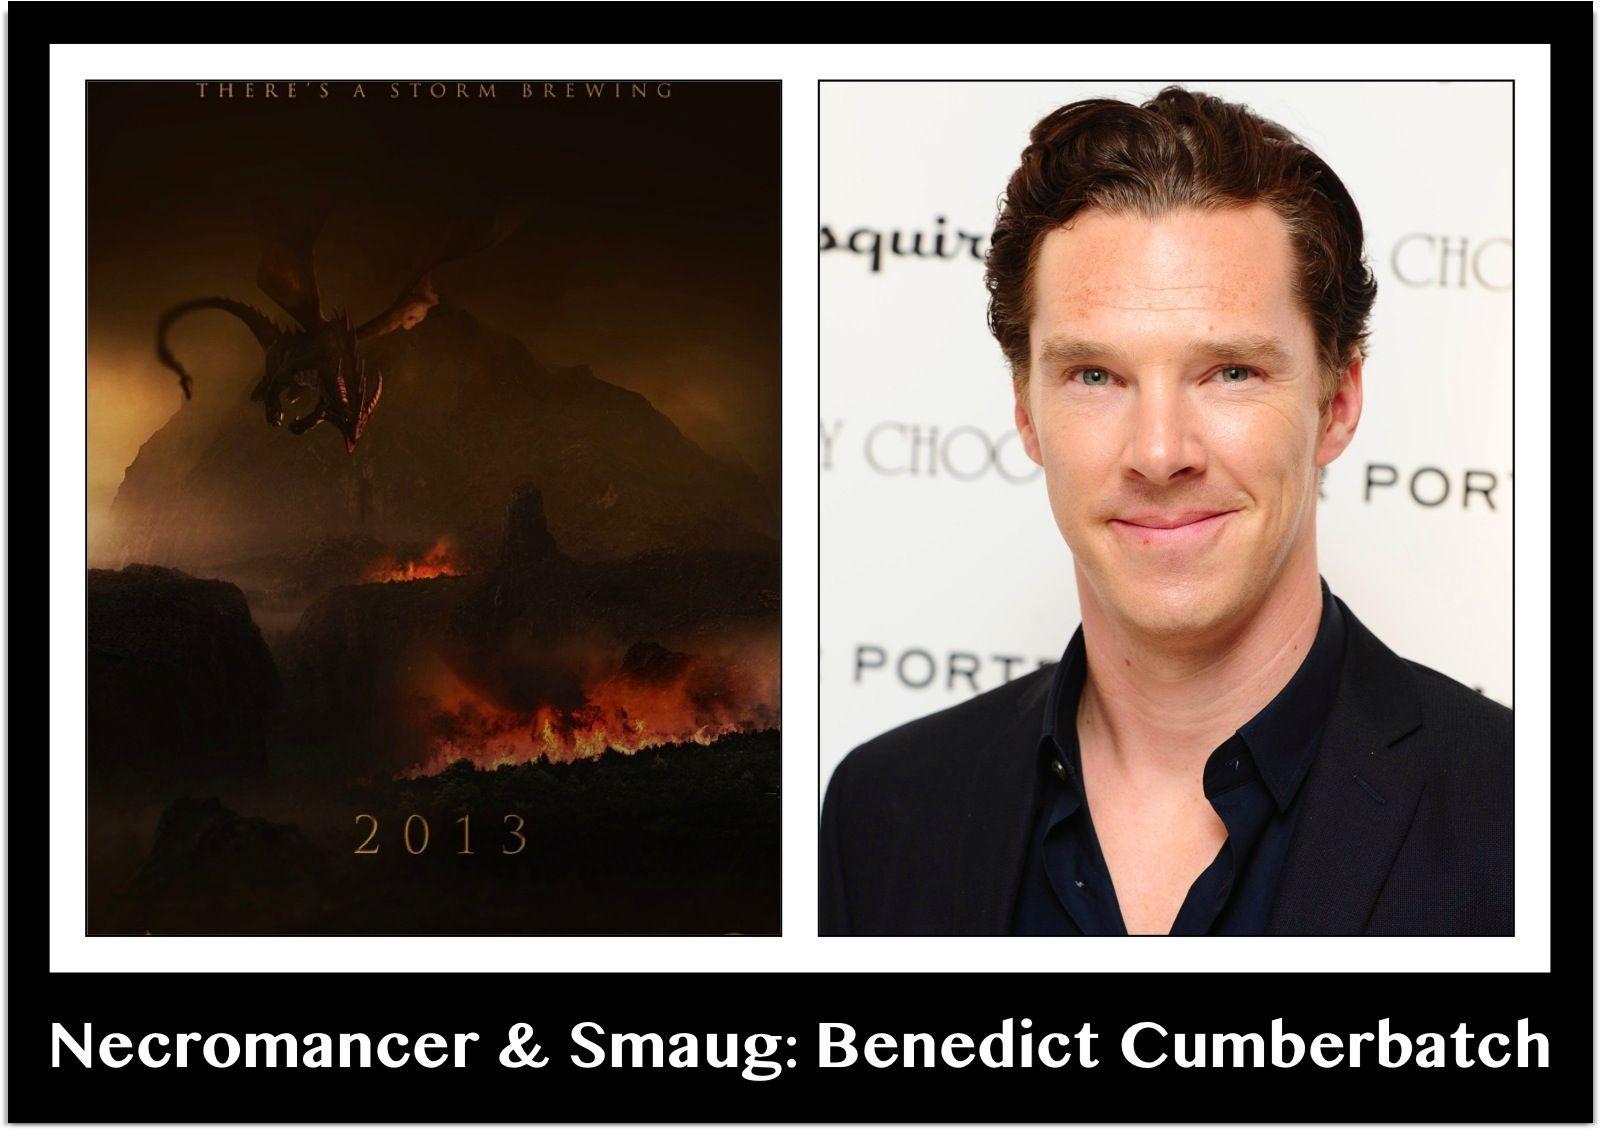 Necromancer & Smaug: Benedict Cumberbatch